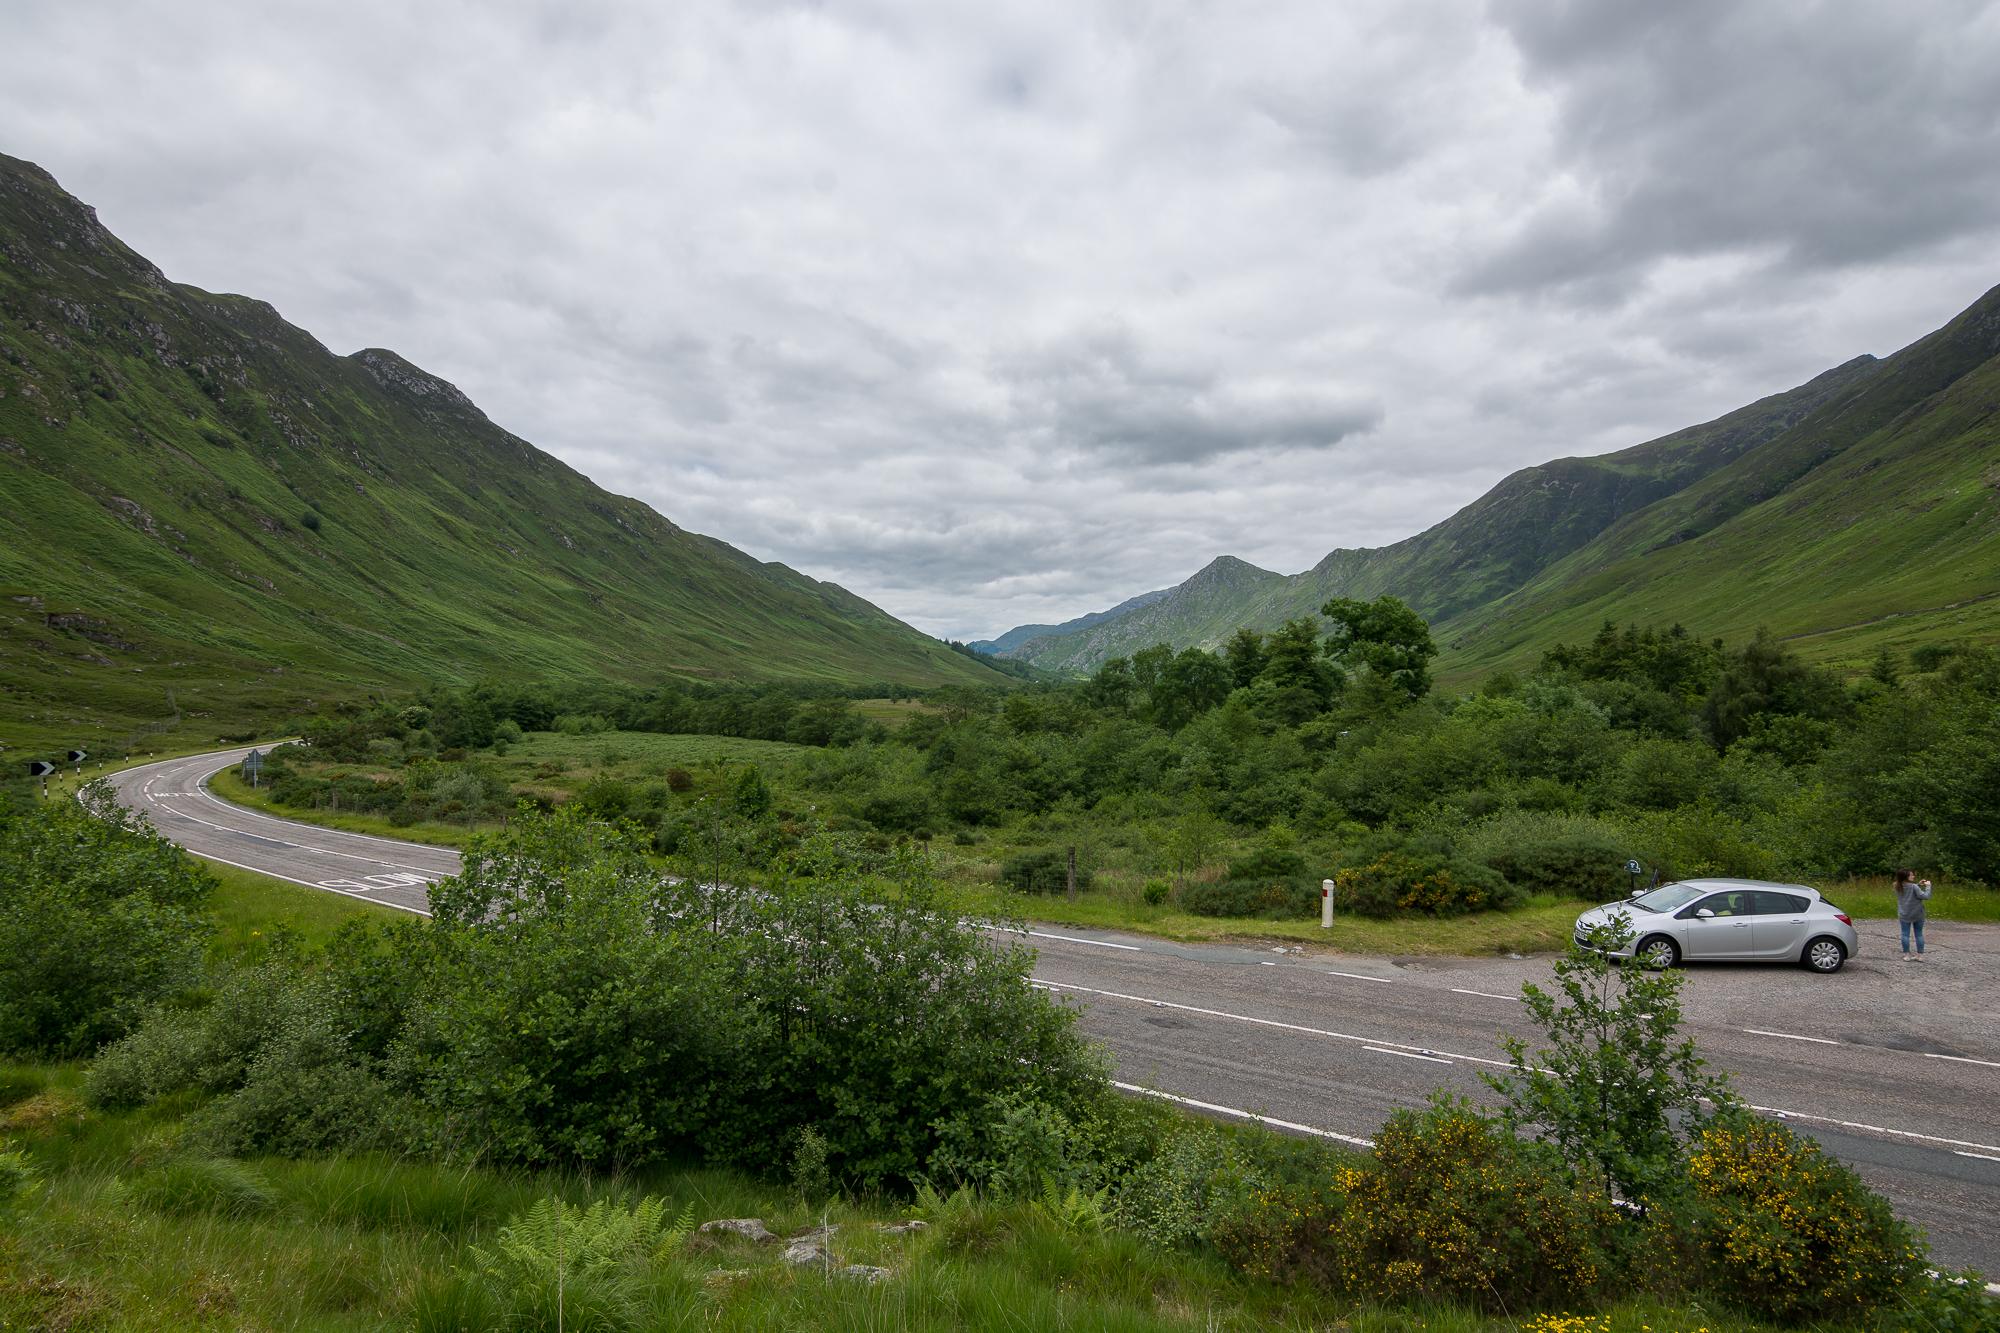 Road to Skye - Scotland, 2014